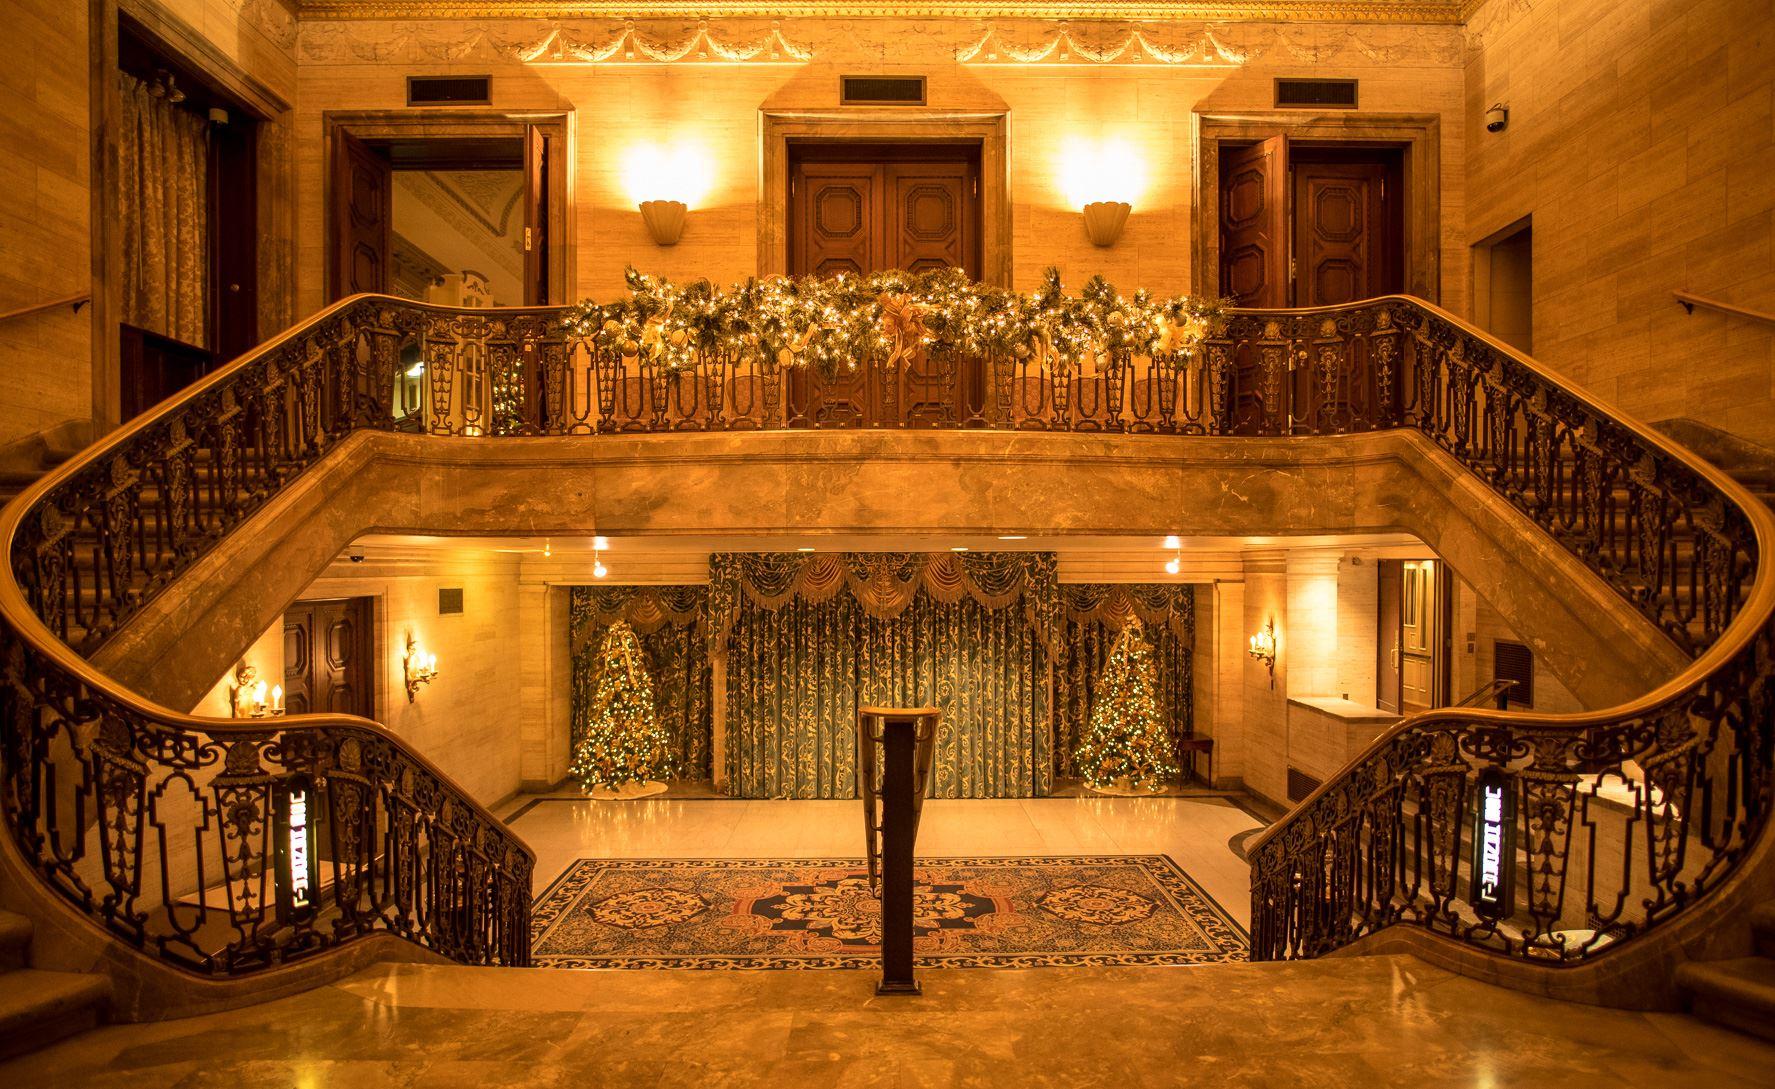 Visit the Historic Hotel du Pont this Holiday Season!